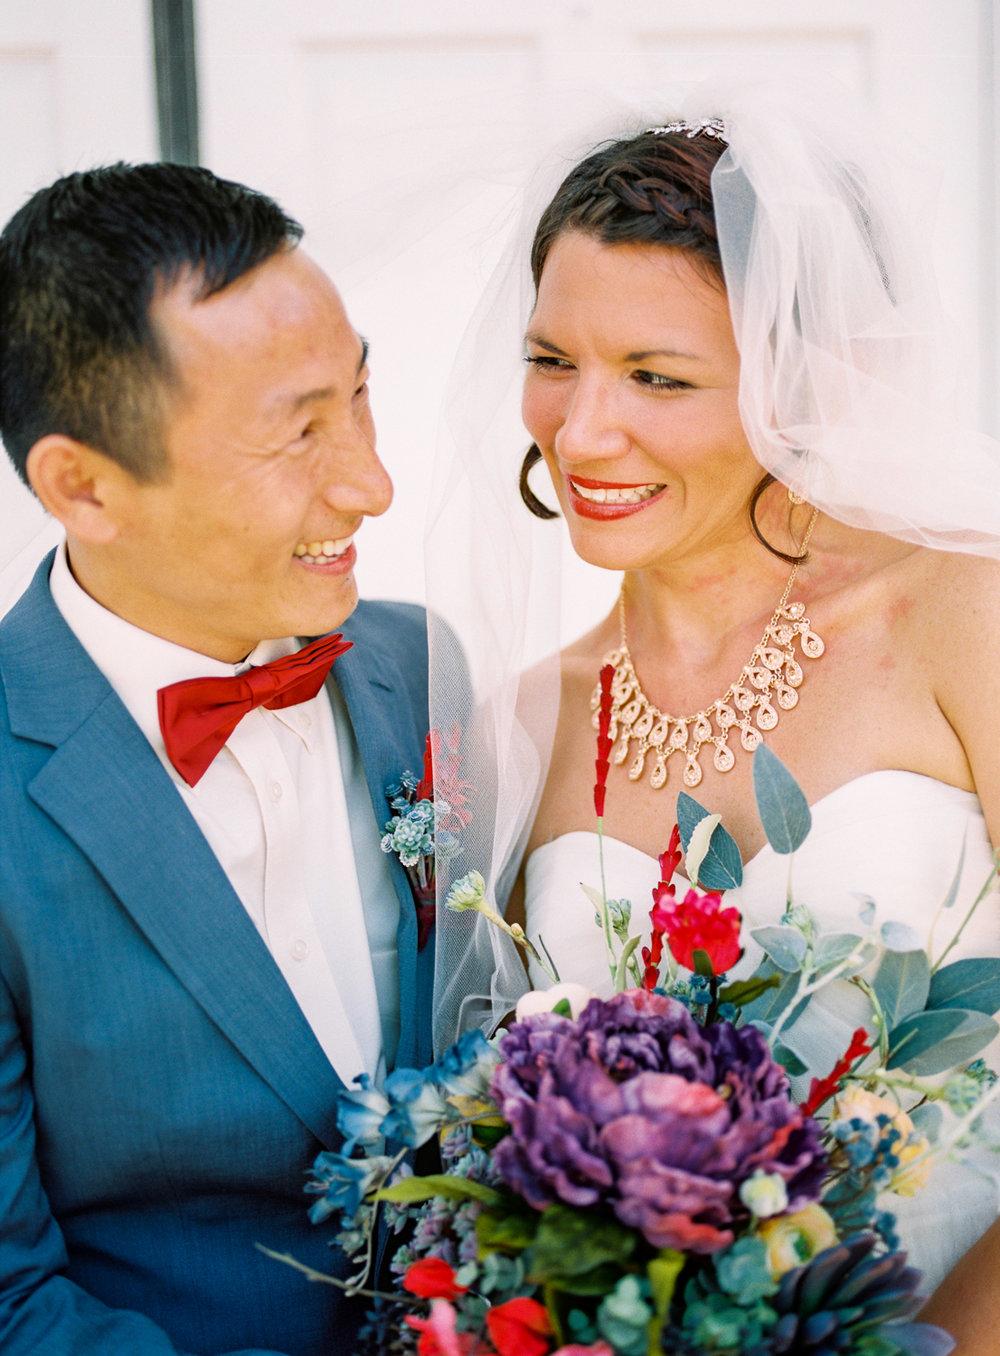 Leaf-&-Pine-Lindsey-Kaiphen-Wedding-12.jpg